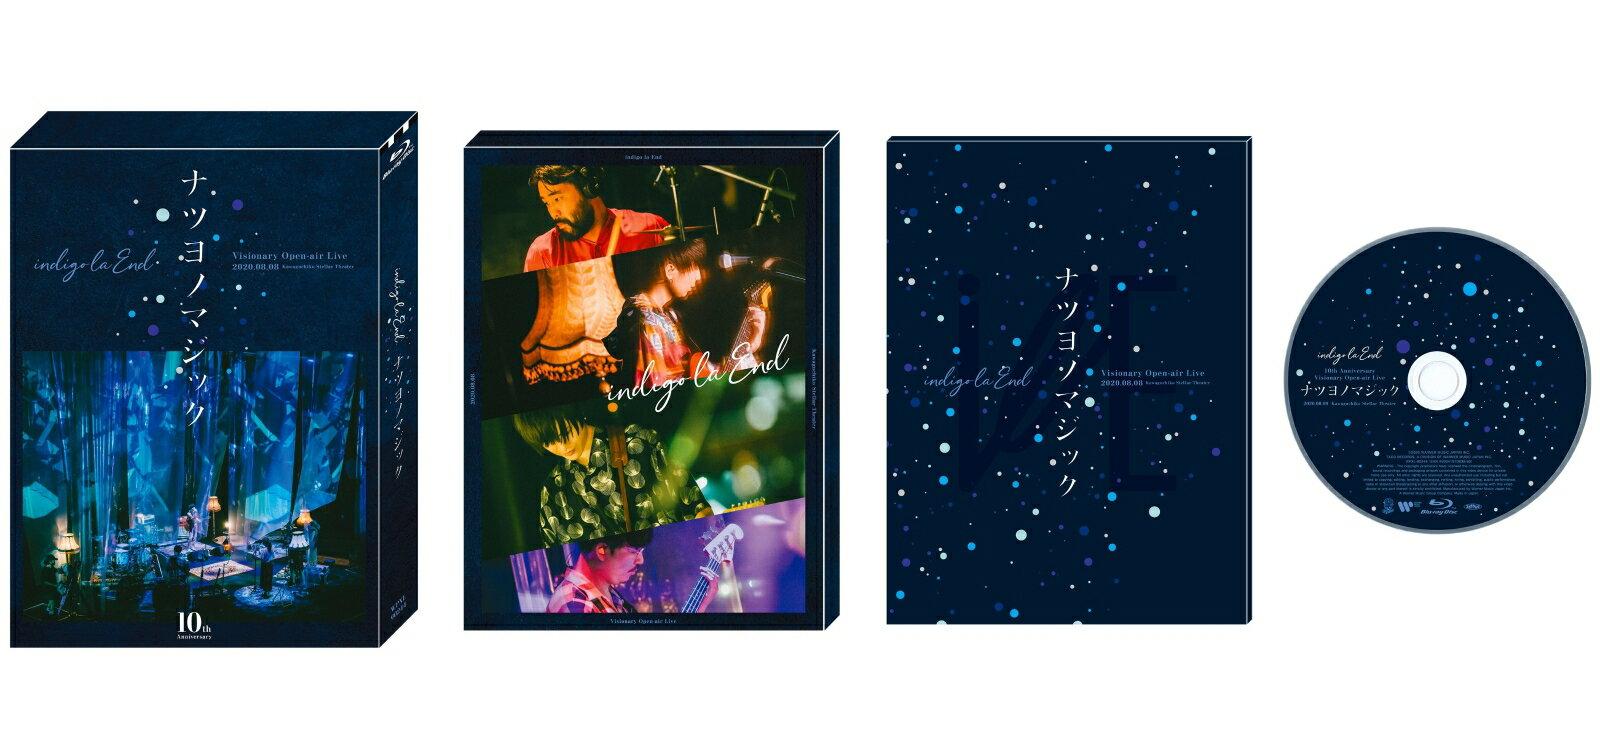 10th Anniversary Visionary Open-air Live ナツヨノマジック 【Blu-ray】画像